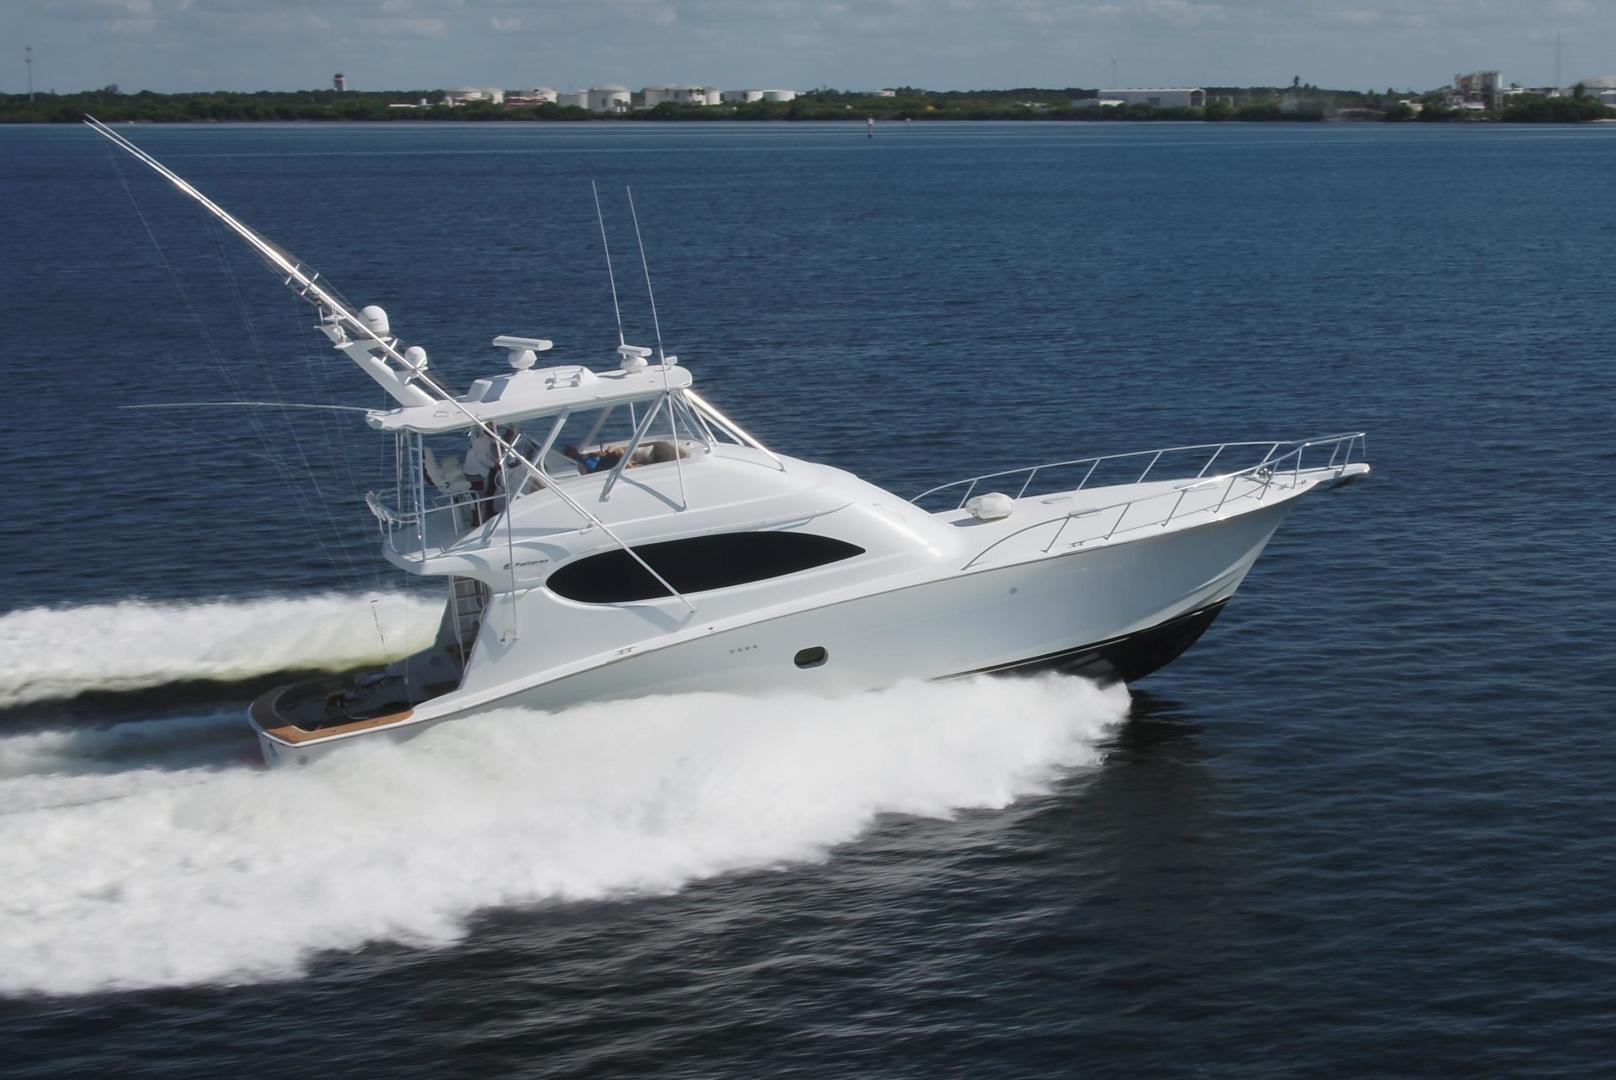 Hatteras-Convertible 2006-ON TARGET Key West-Florida-United States-1468106 | Thumbnail